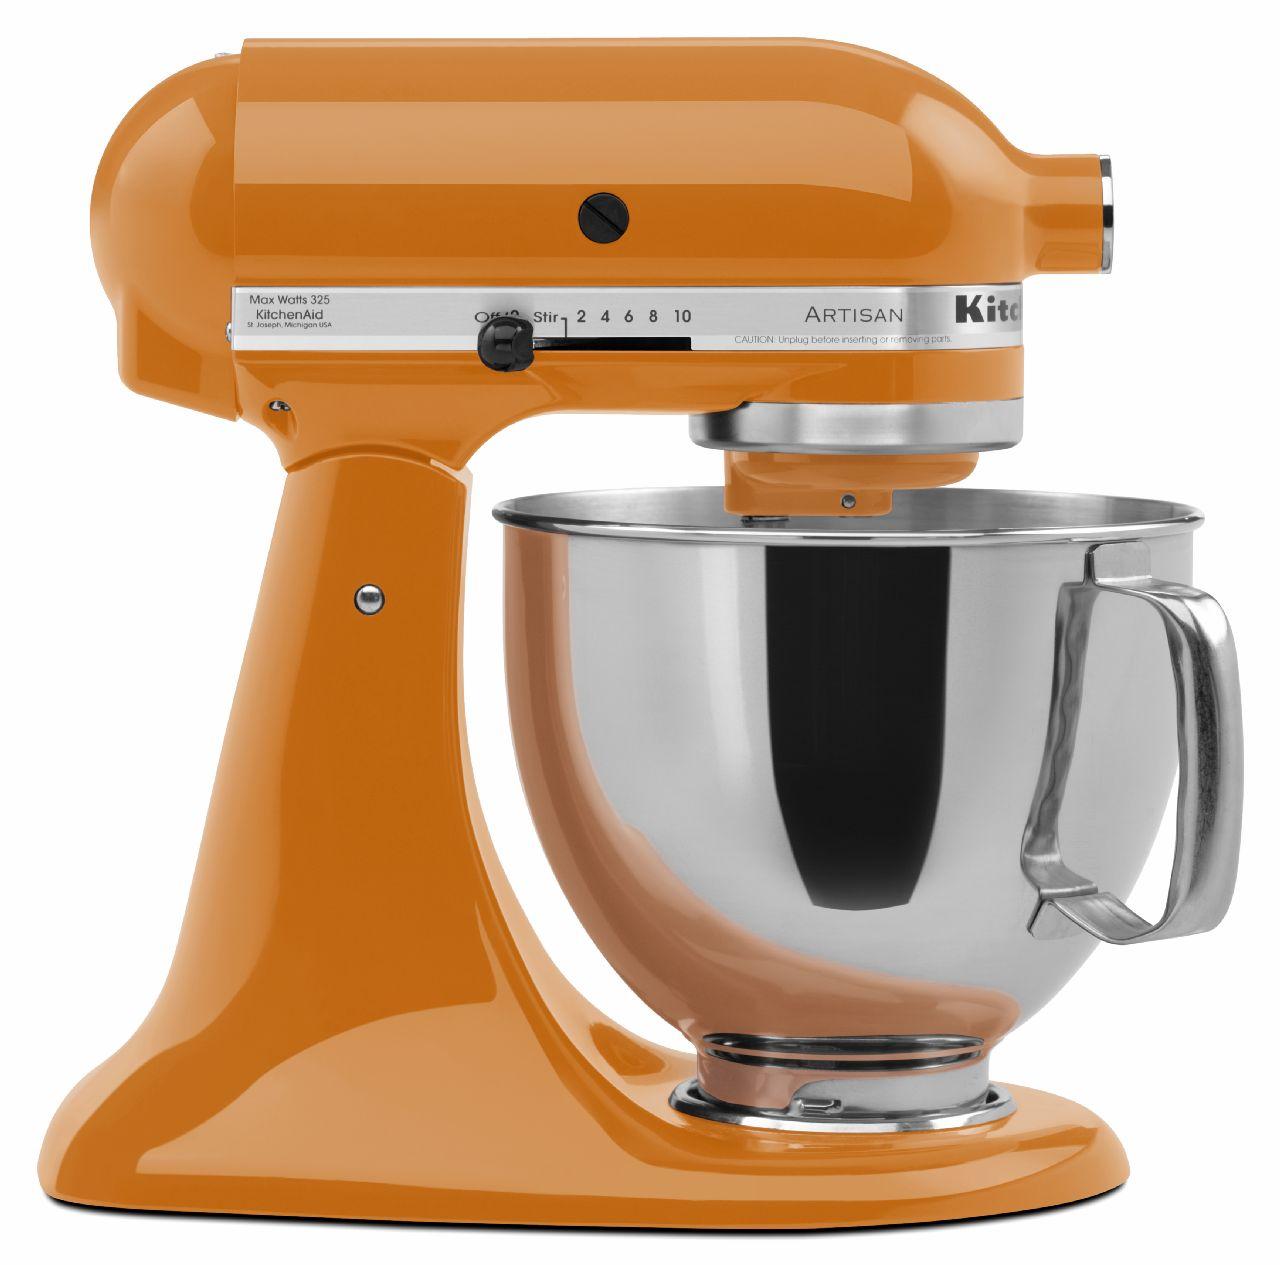 KitchenAid-Artisan-Series-5-Quart-Tilt-Head-Stand-Mixer-10-Speeds-KSM150PS thumbnail 109